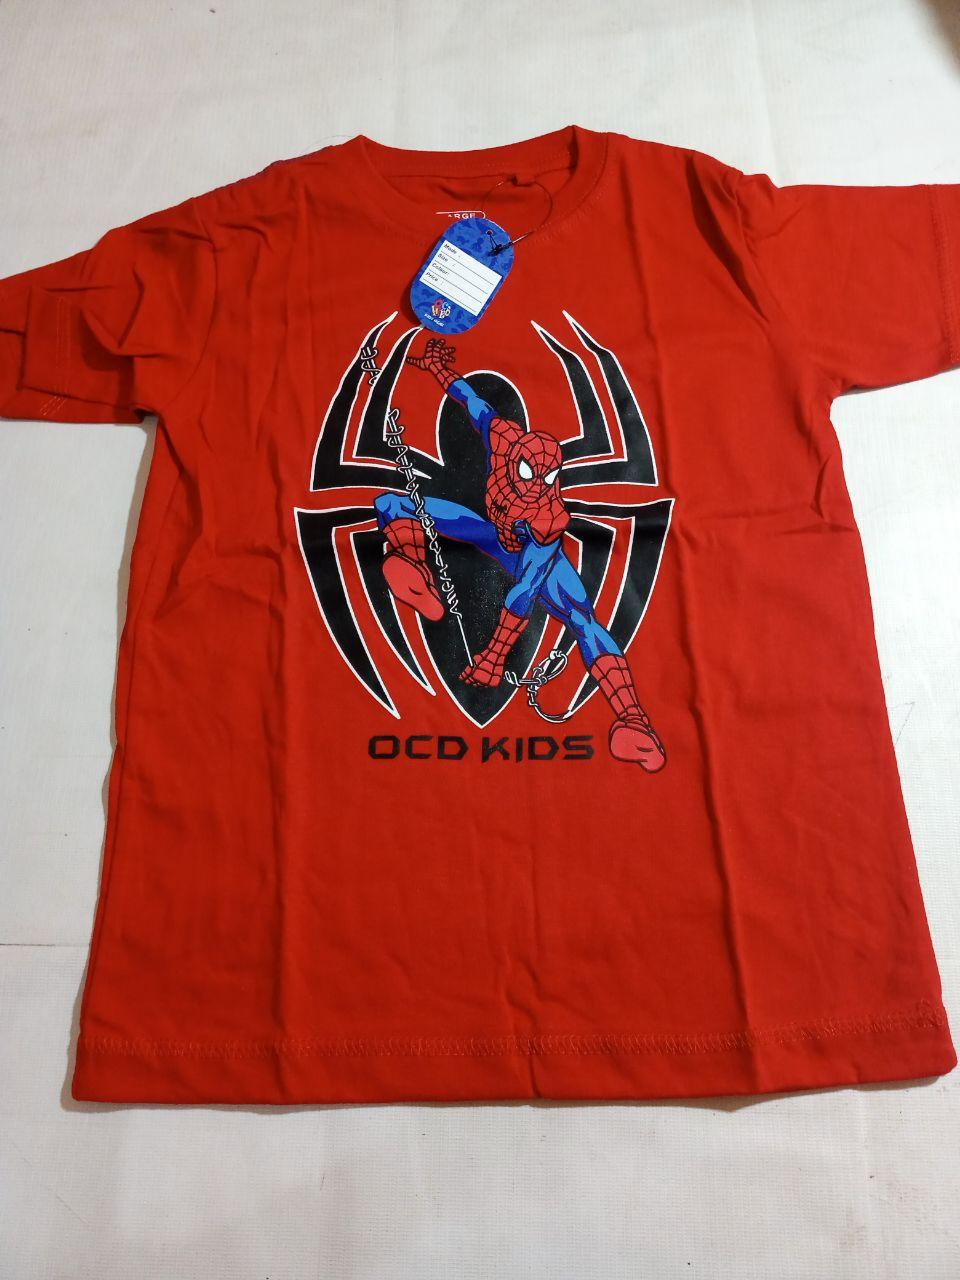 ini adalah Kaos Anak Karakter L, size: LD 61 cm x panjang 48 cm, material: Cotton soft spandex, color: red, brand: Bajuanakindonesia, age_group: kids, gender: male